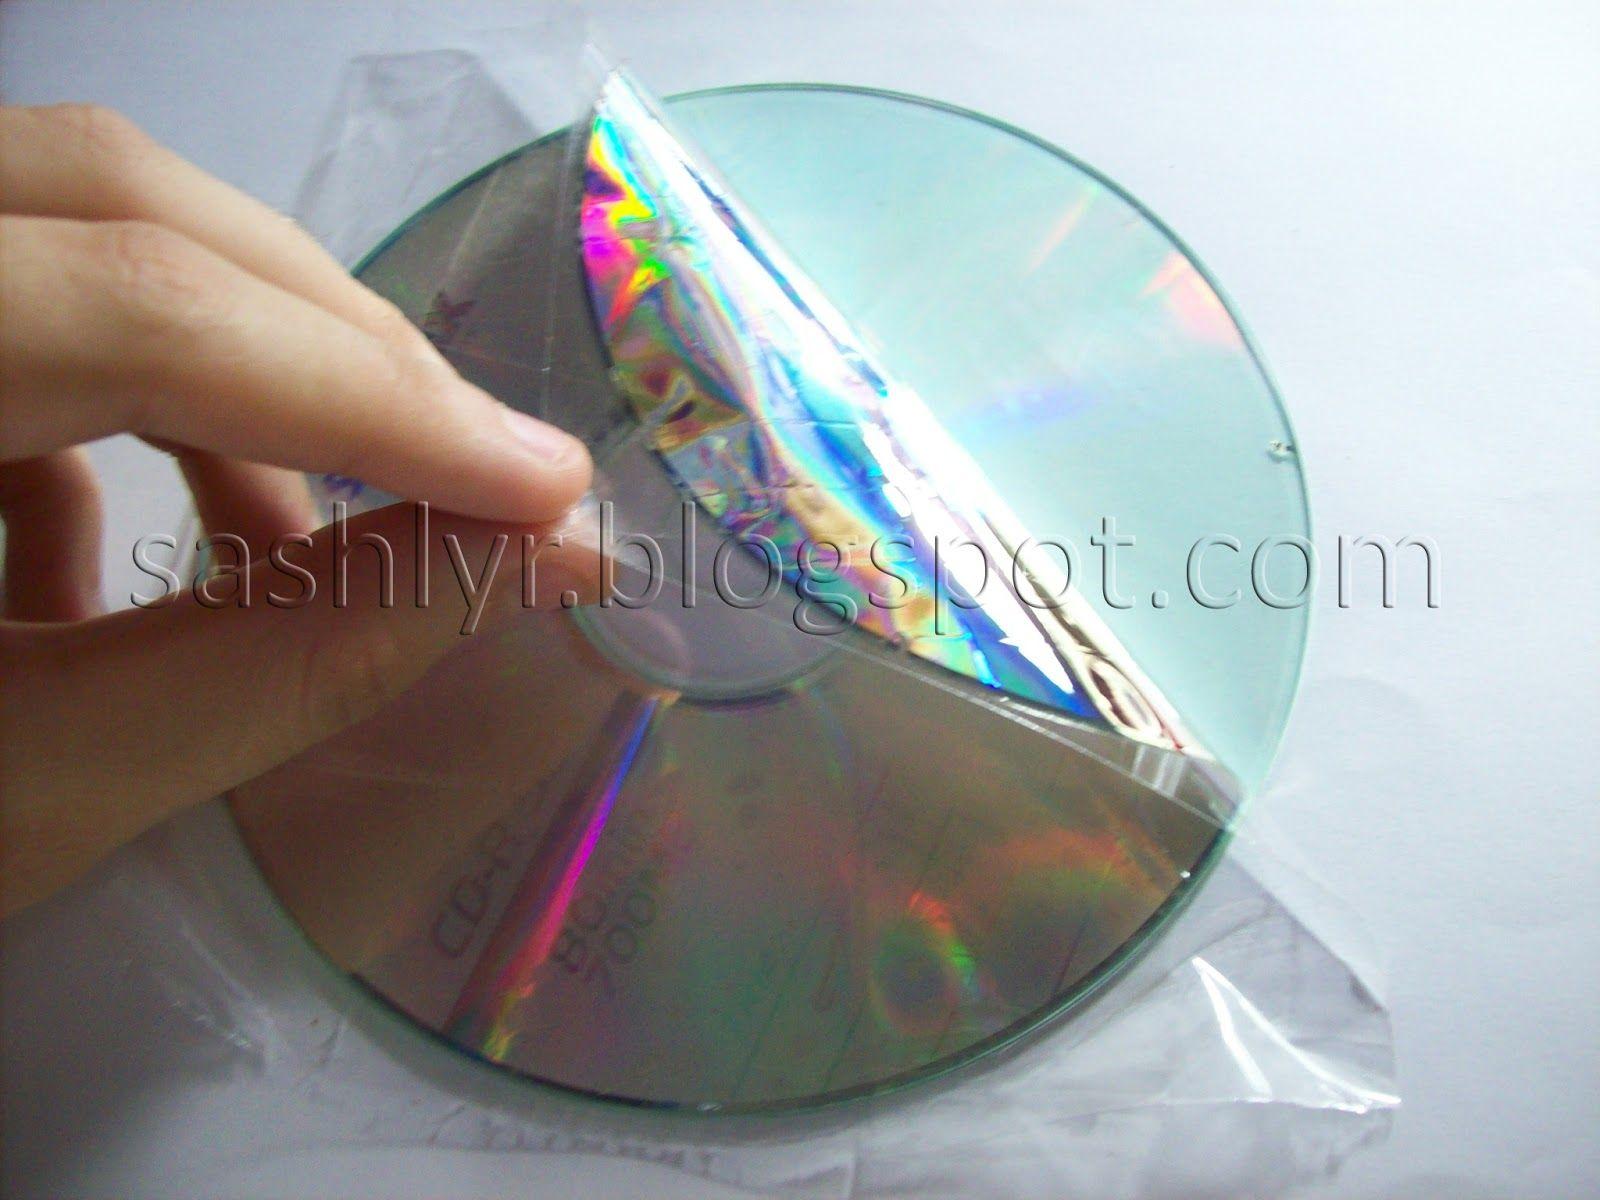 Sashlyr Arte y decoraci n Tutorial o reciclar cds